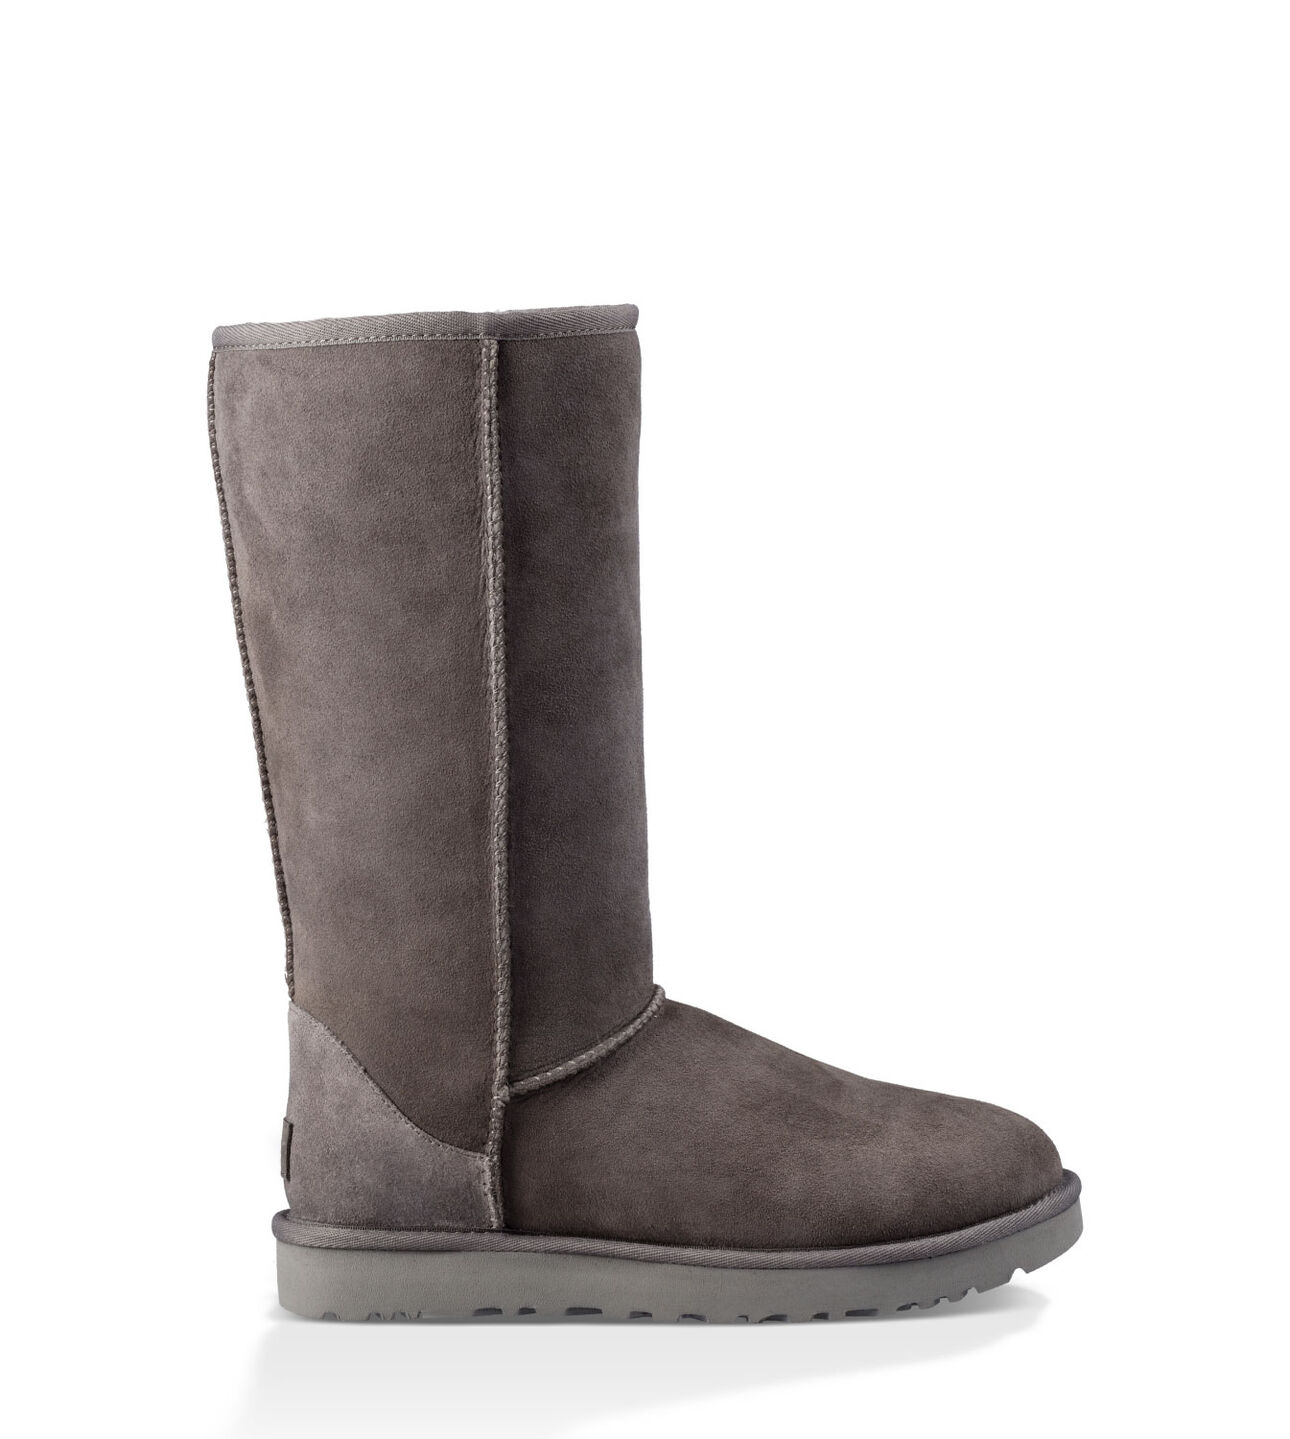 Classic Tall Sheepskin Boots Ugg 174 Official